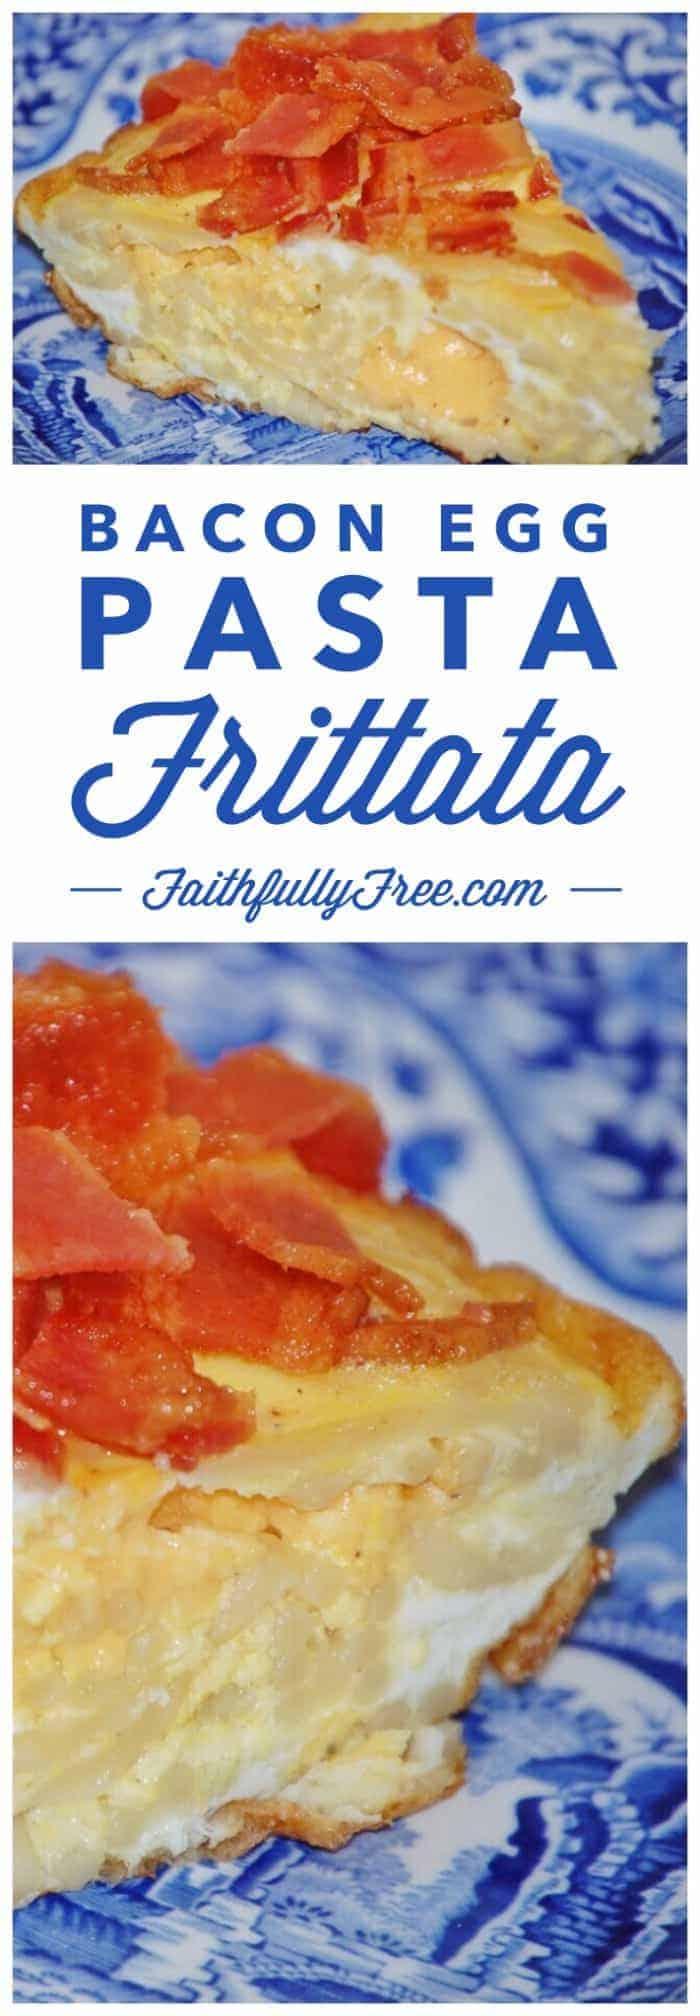 Bacon Egg Pasta Frittata Recipe